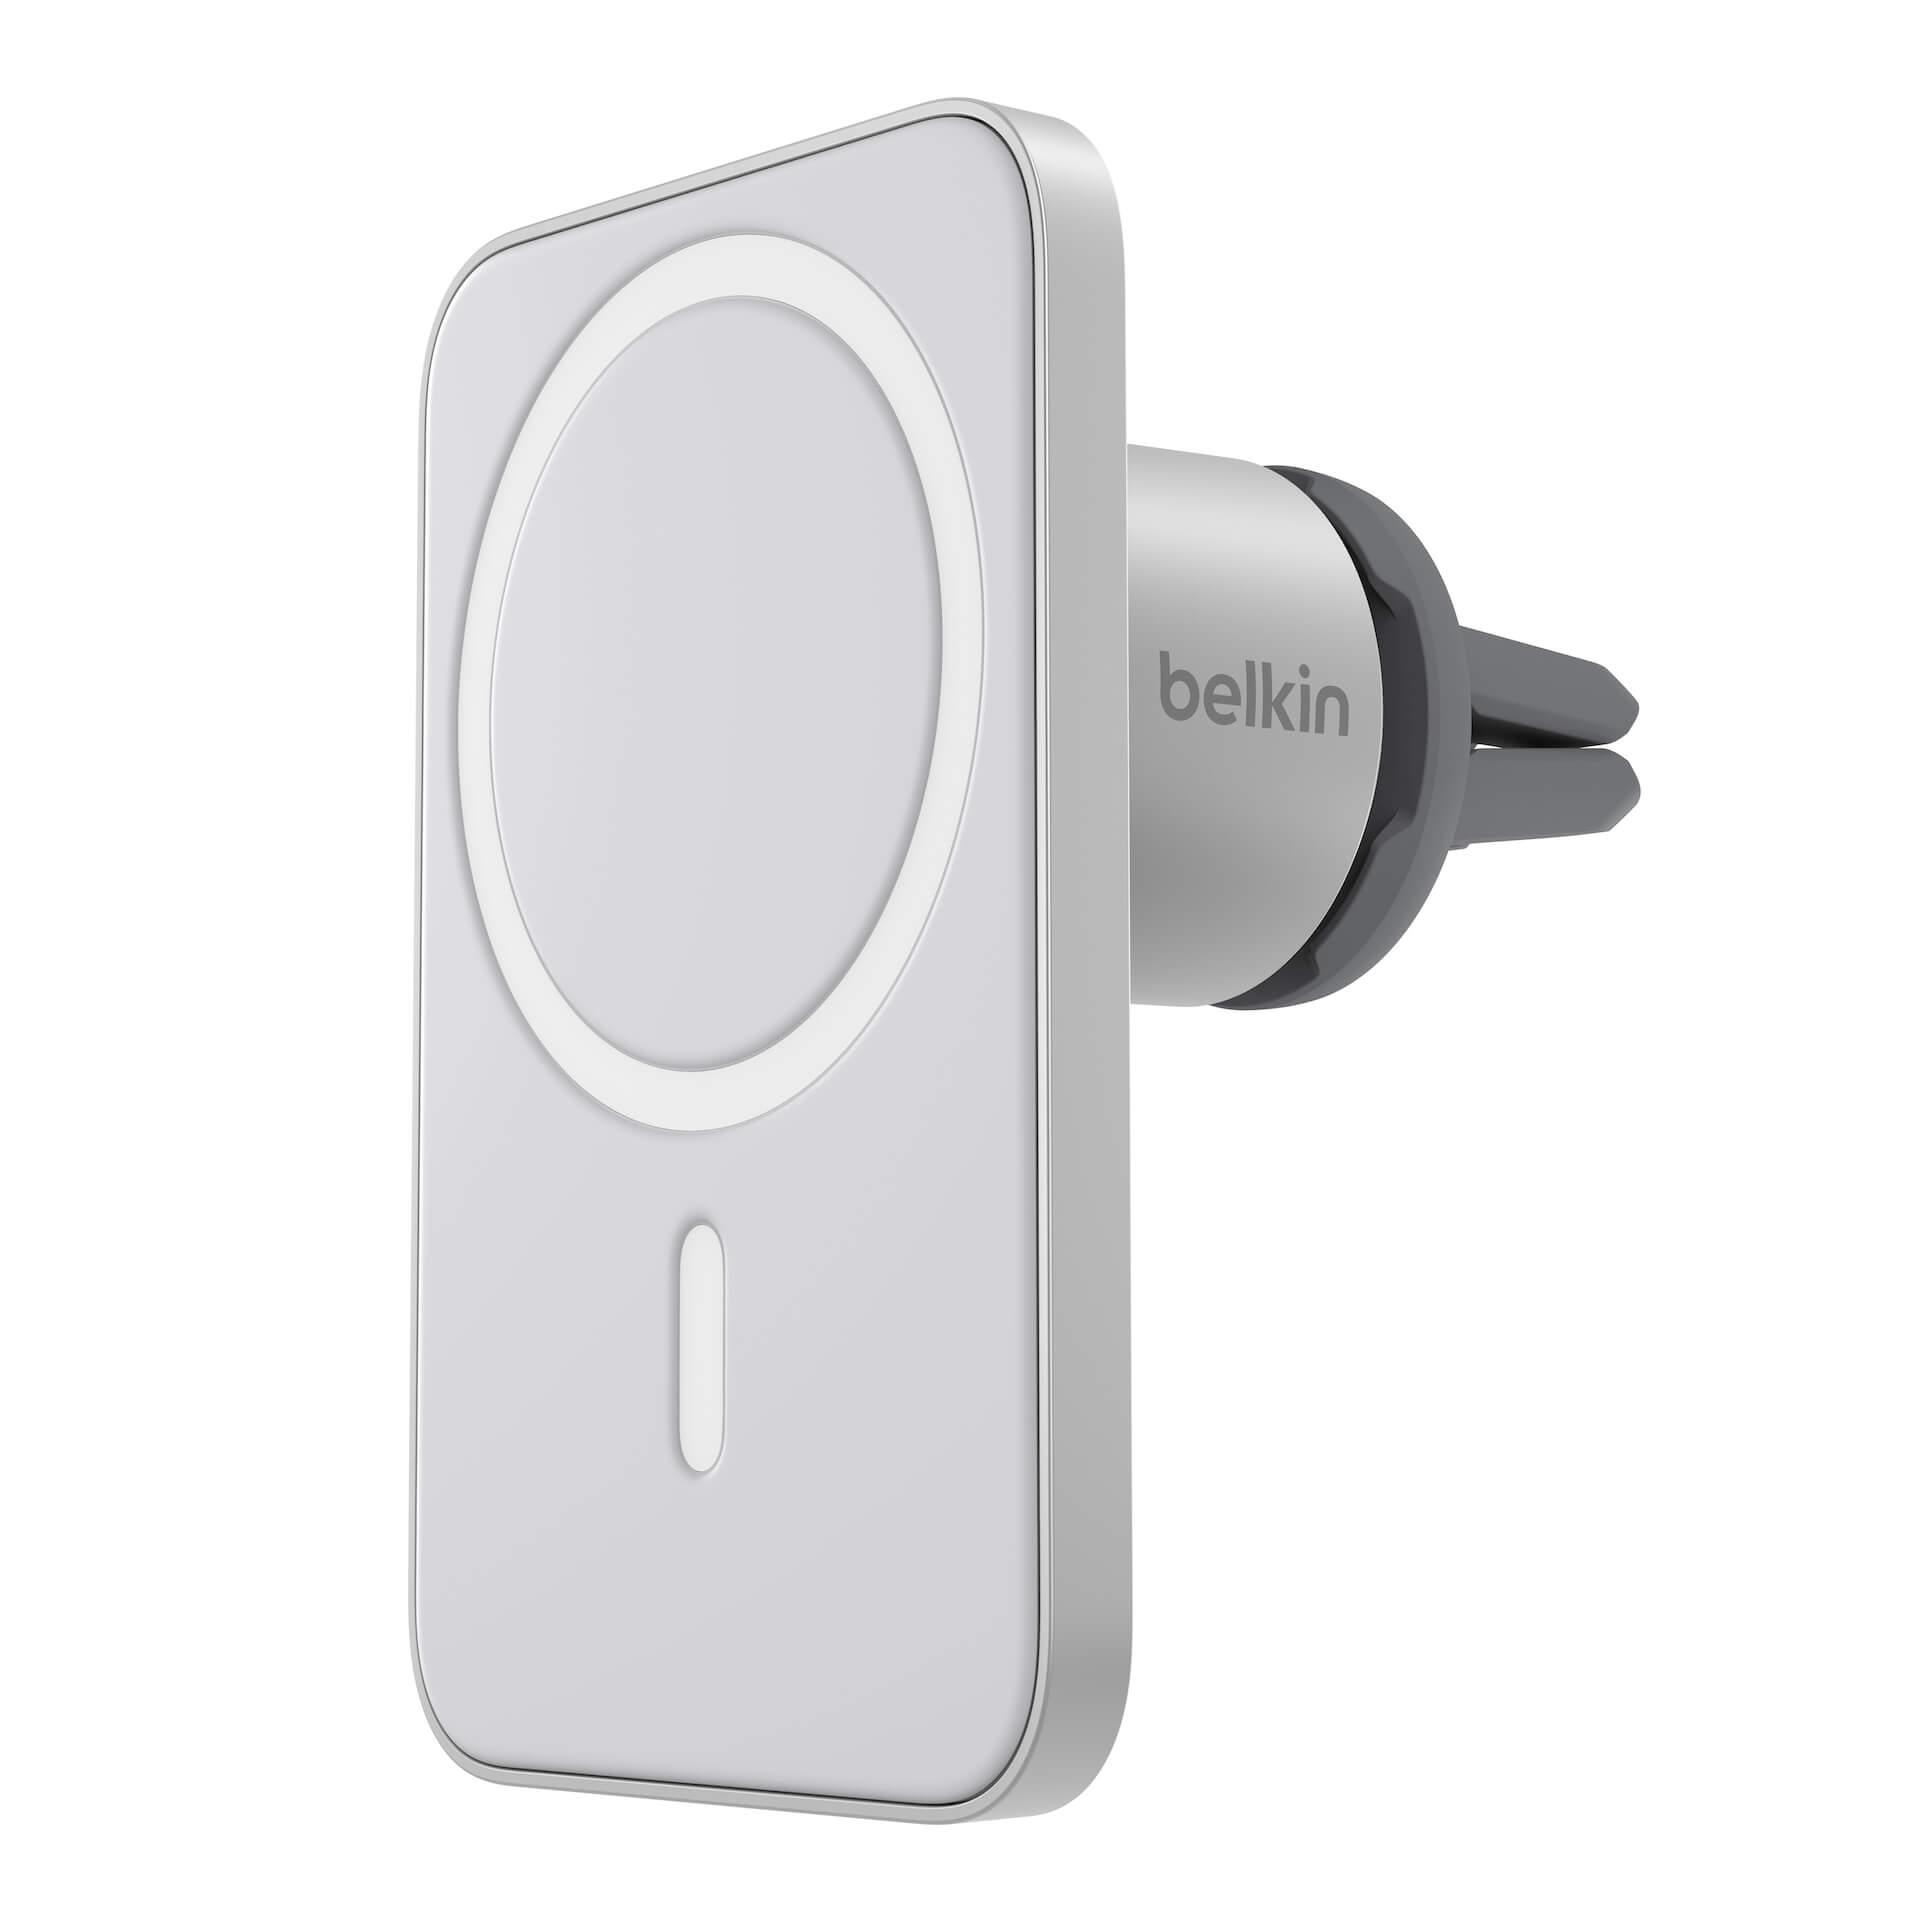 BelkinからiPhone 12シリーズに対応した高機能製品3点が発売!MagSafeを利用した3-in-1のワイヤレス充電器などが登場 tech210120_magsafe_belkin_4